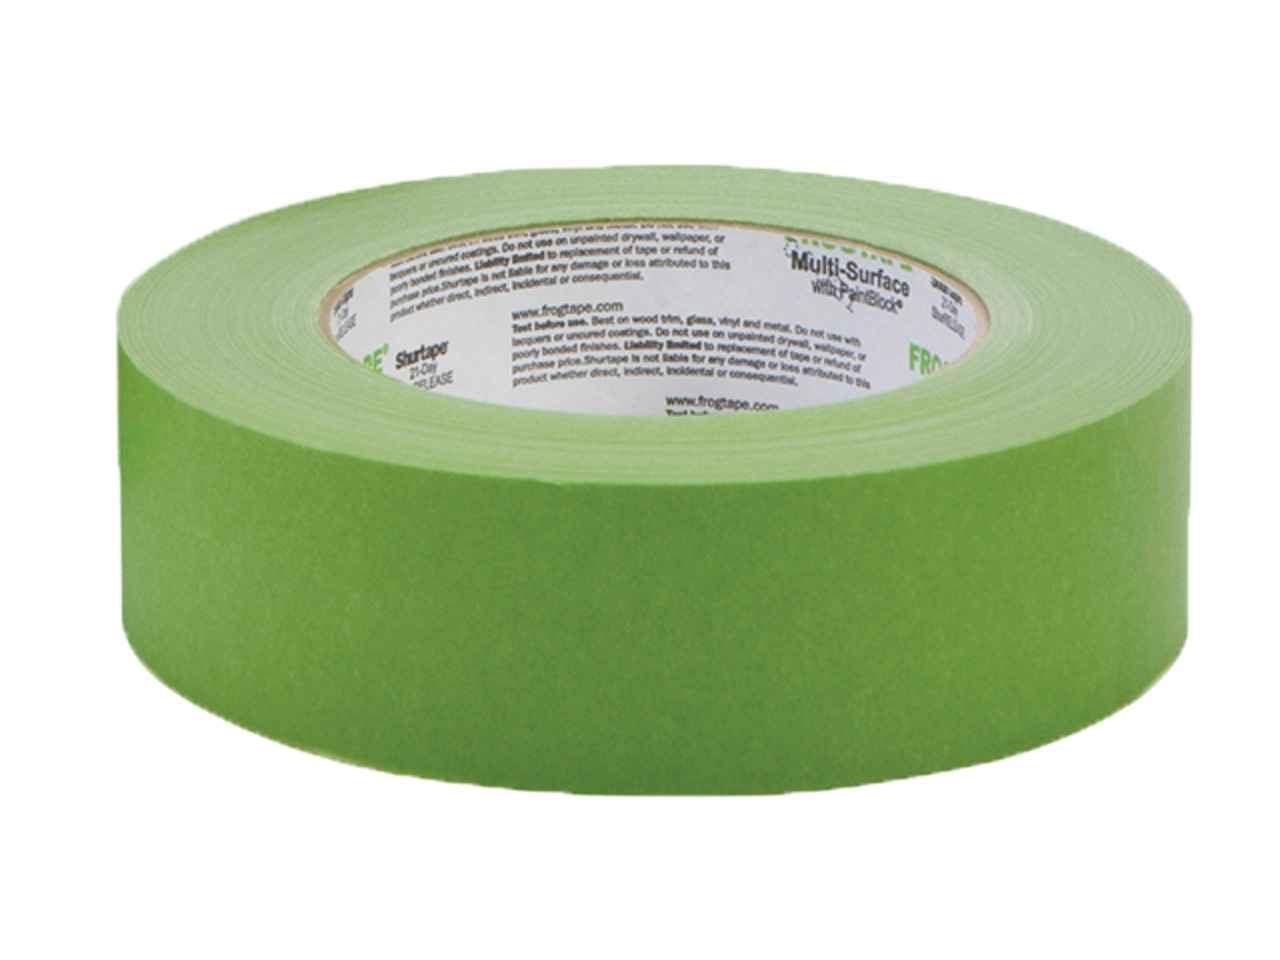 frogtape 155874 36mm x 41.1m multi-surface masking tape